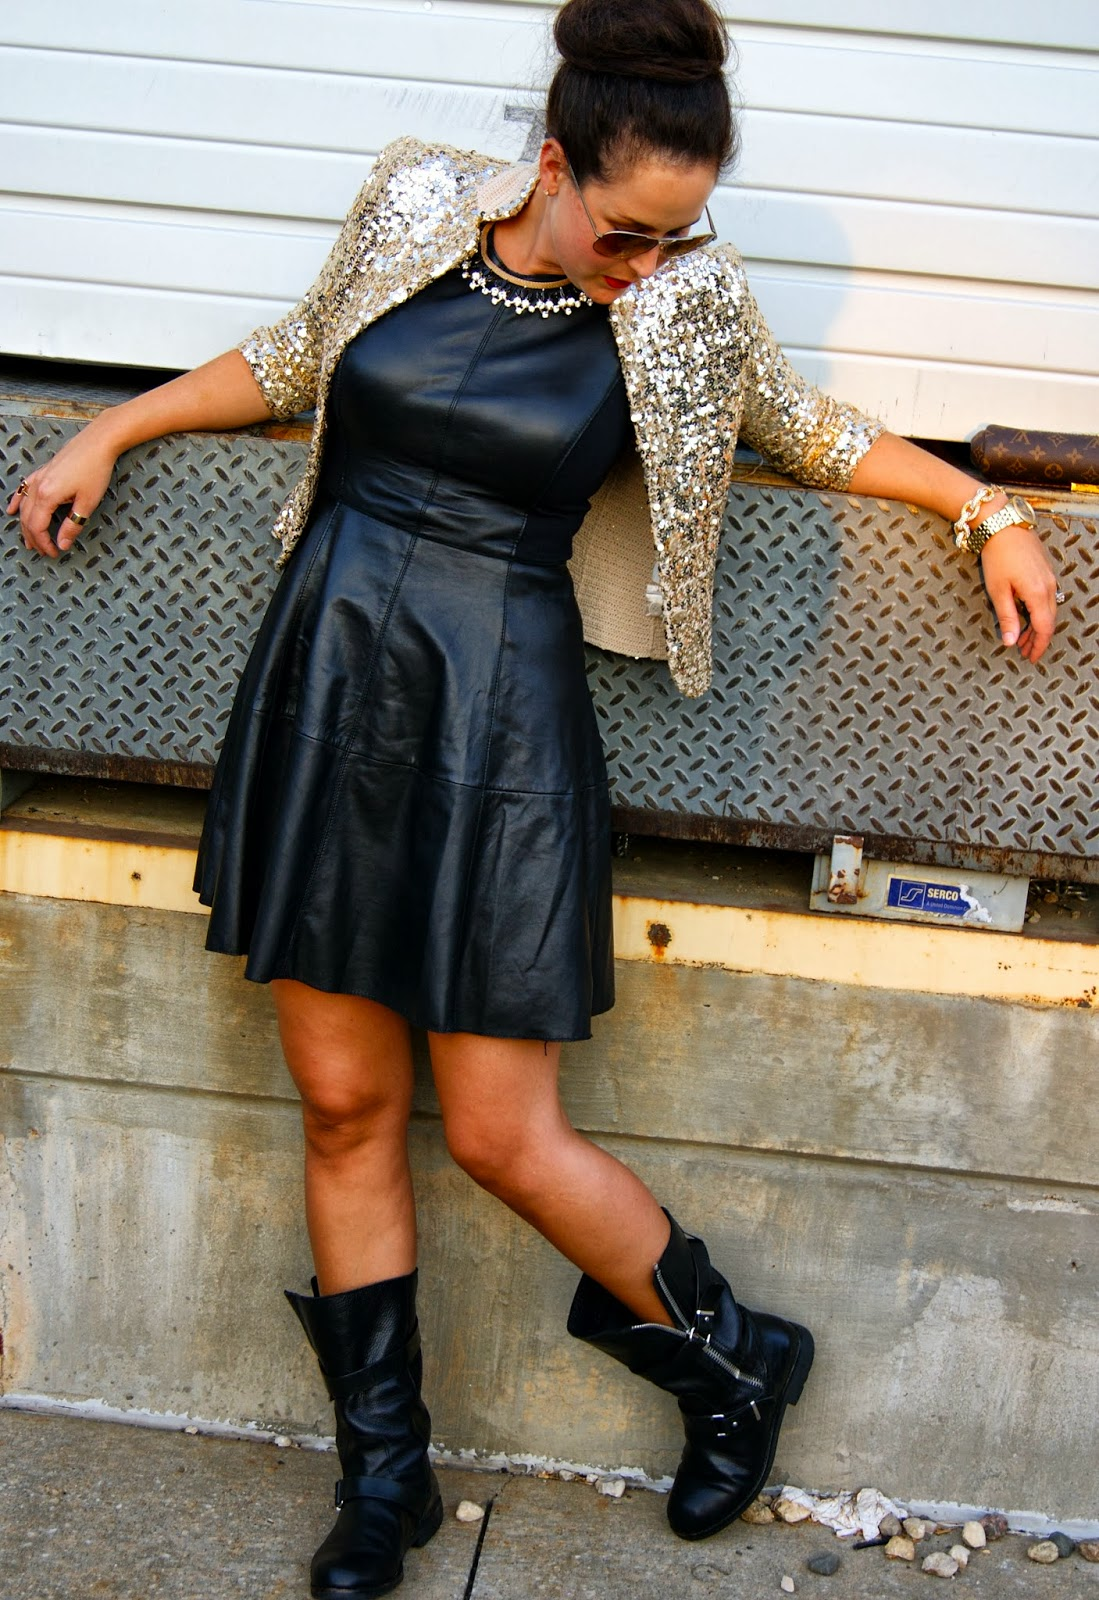 Leather dress by Halogen via Nordstrom